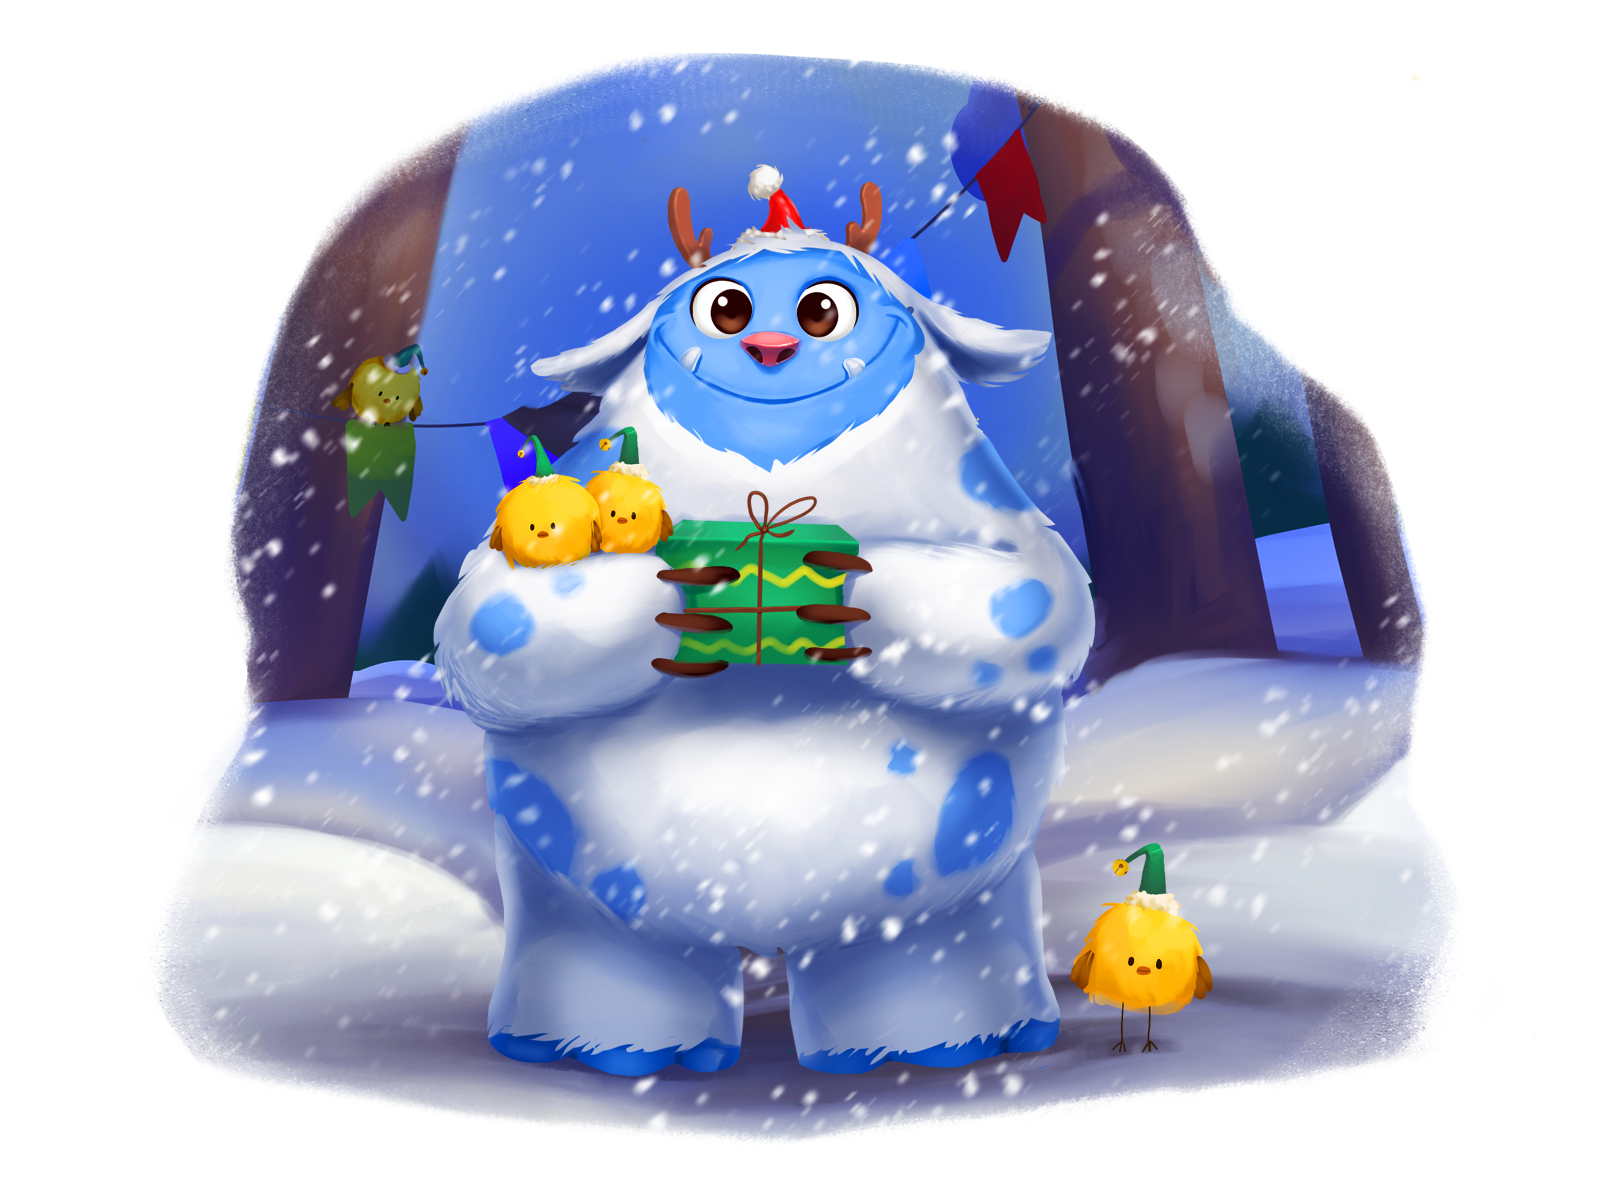 Winter Wonderland New 40+ Illustrations of Christmas and